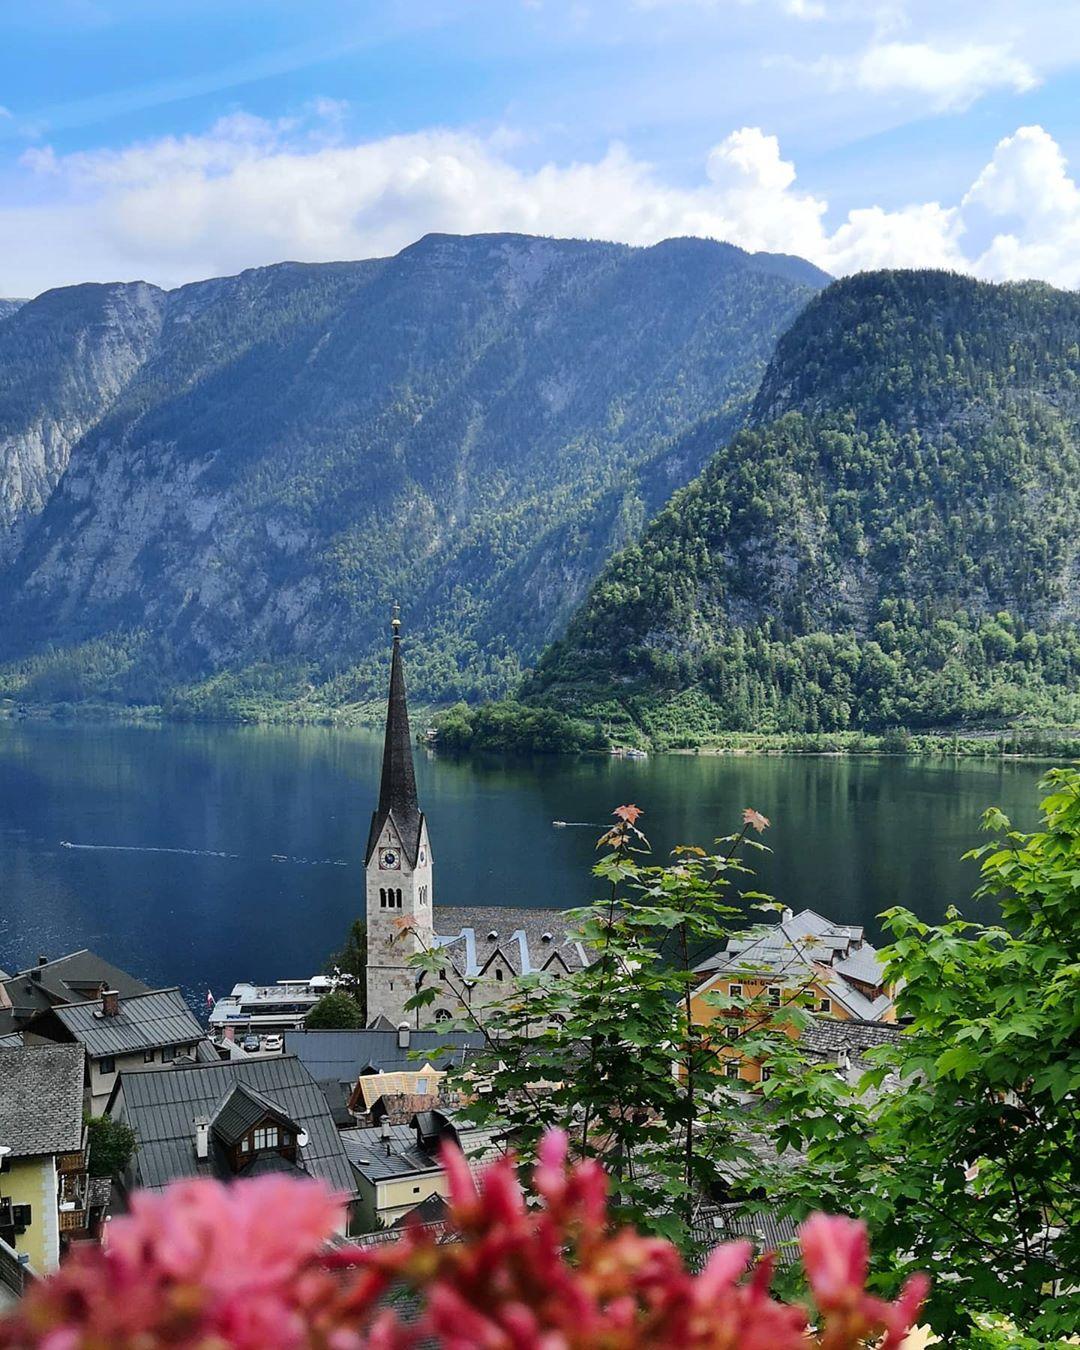 Wonderful view of the Hallstatt lake